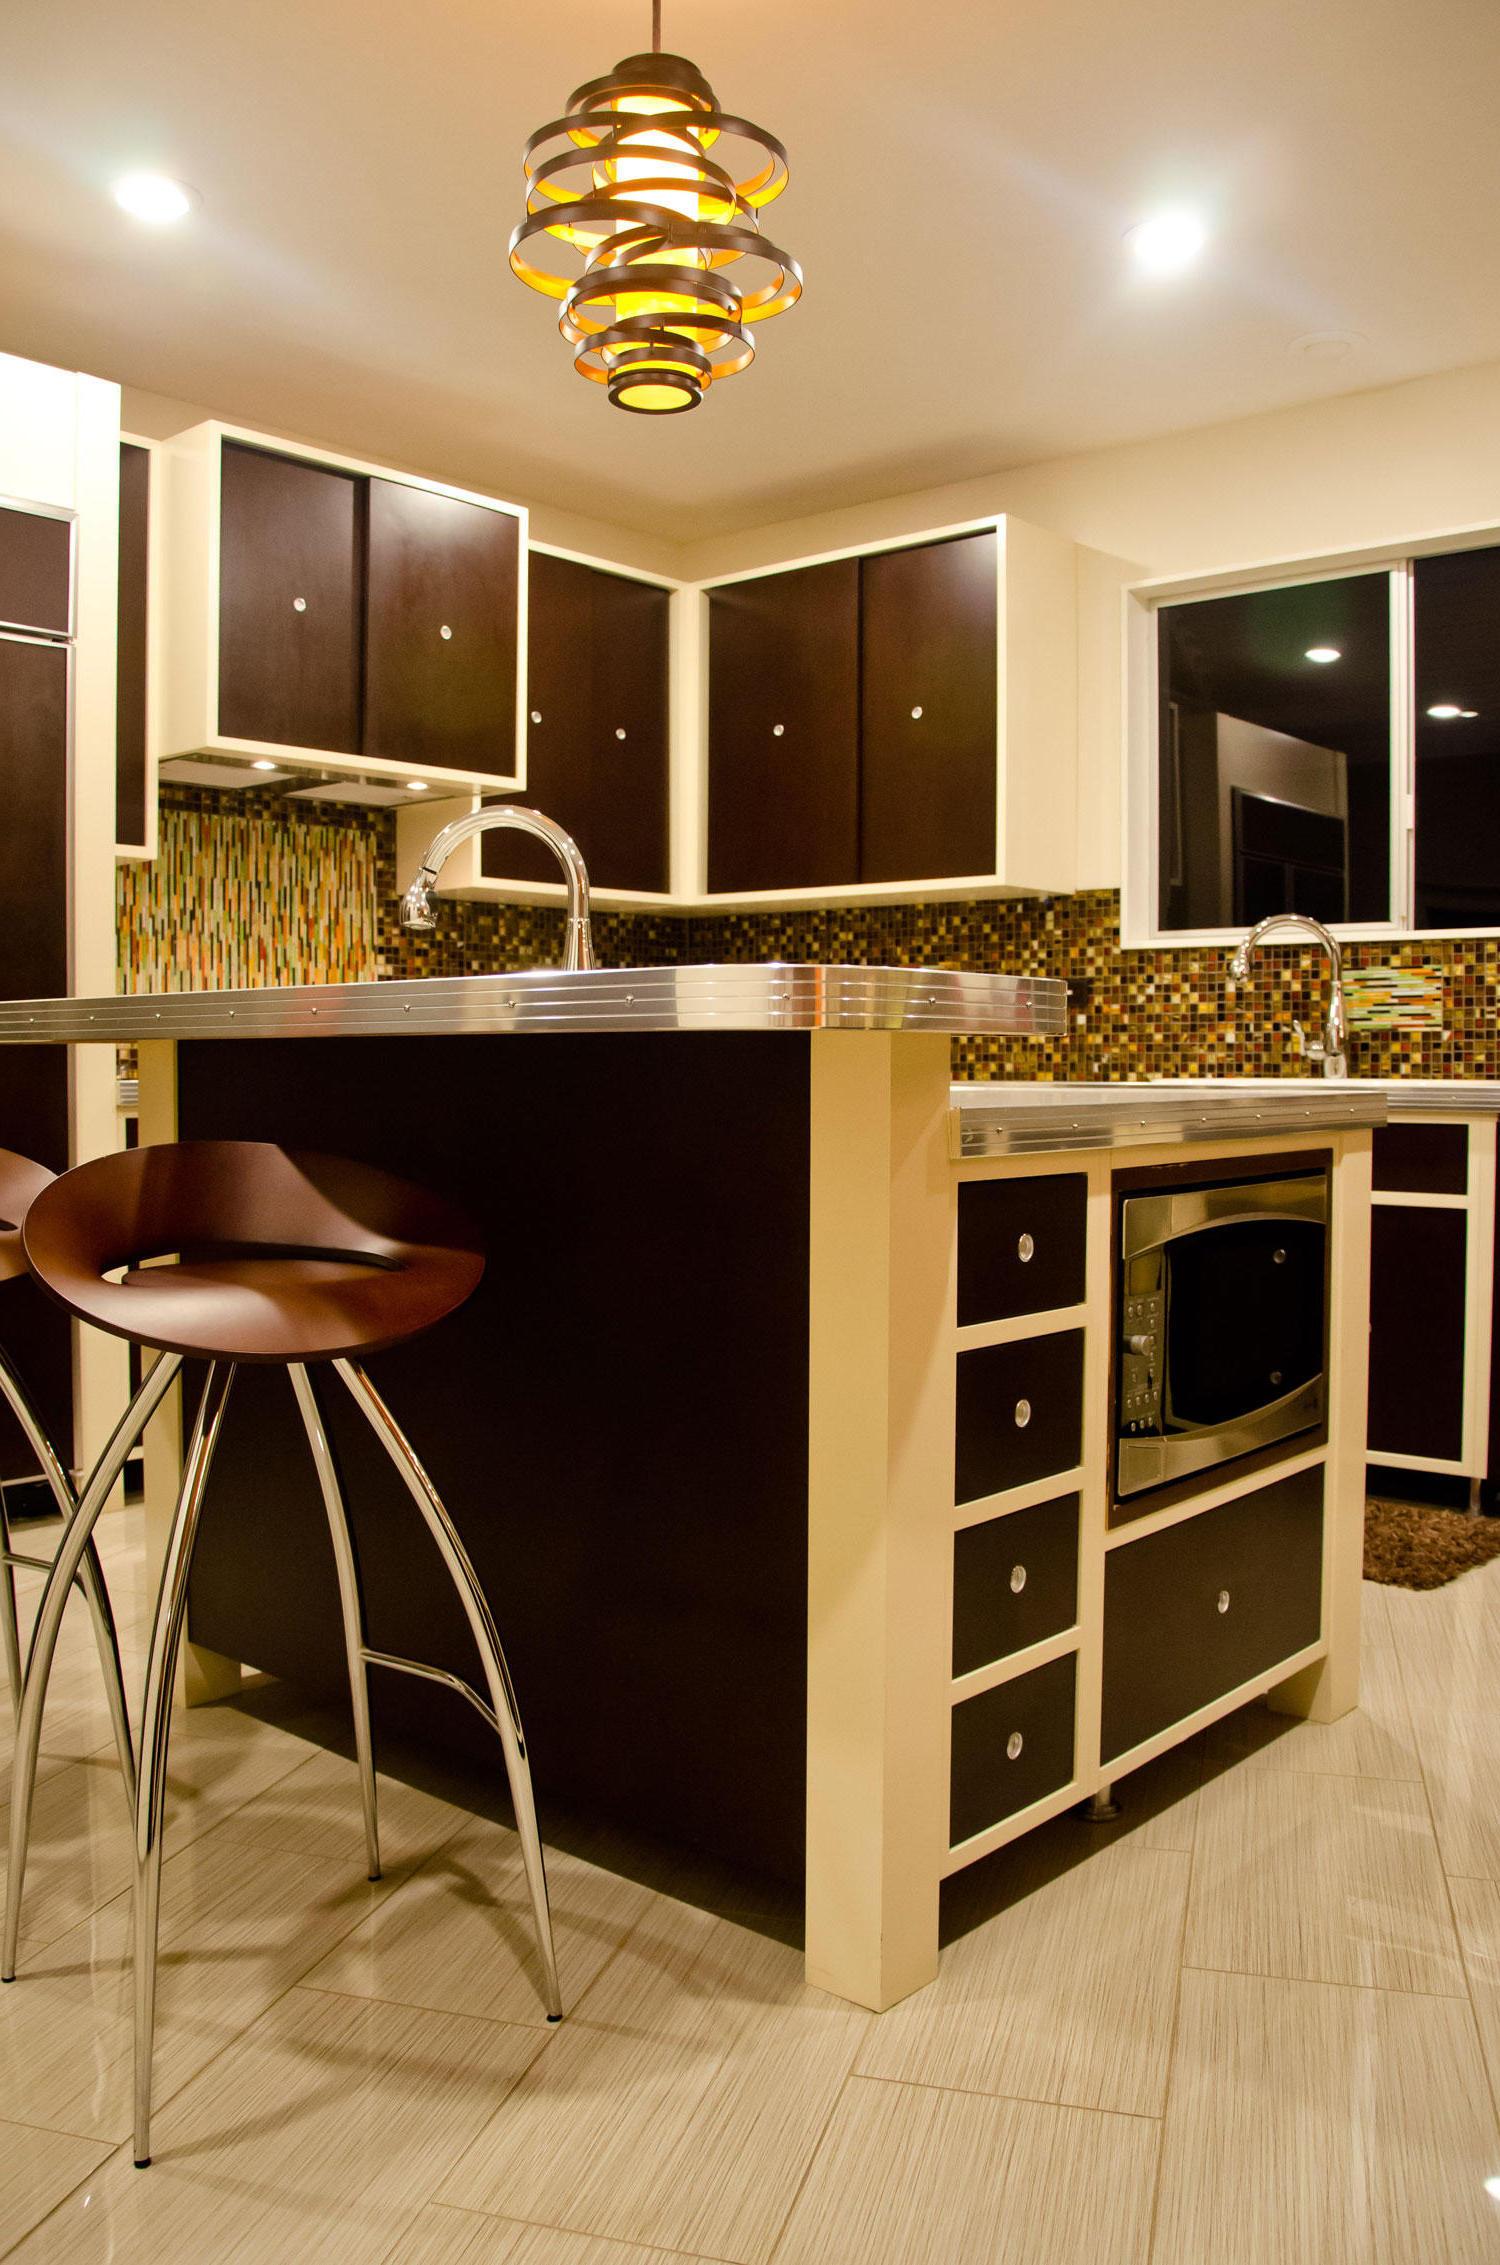 Enchanting Very Small Kitchen Designs 2716 Kitchen Ideas